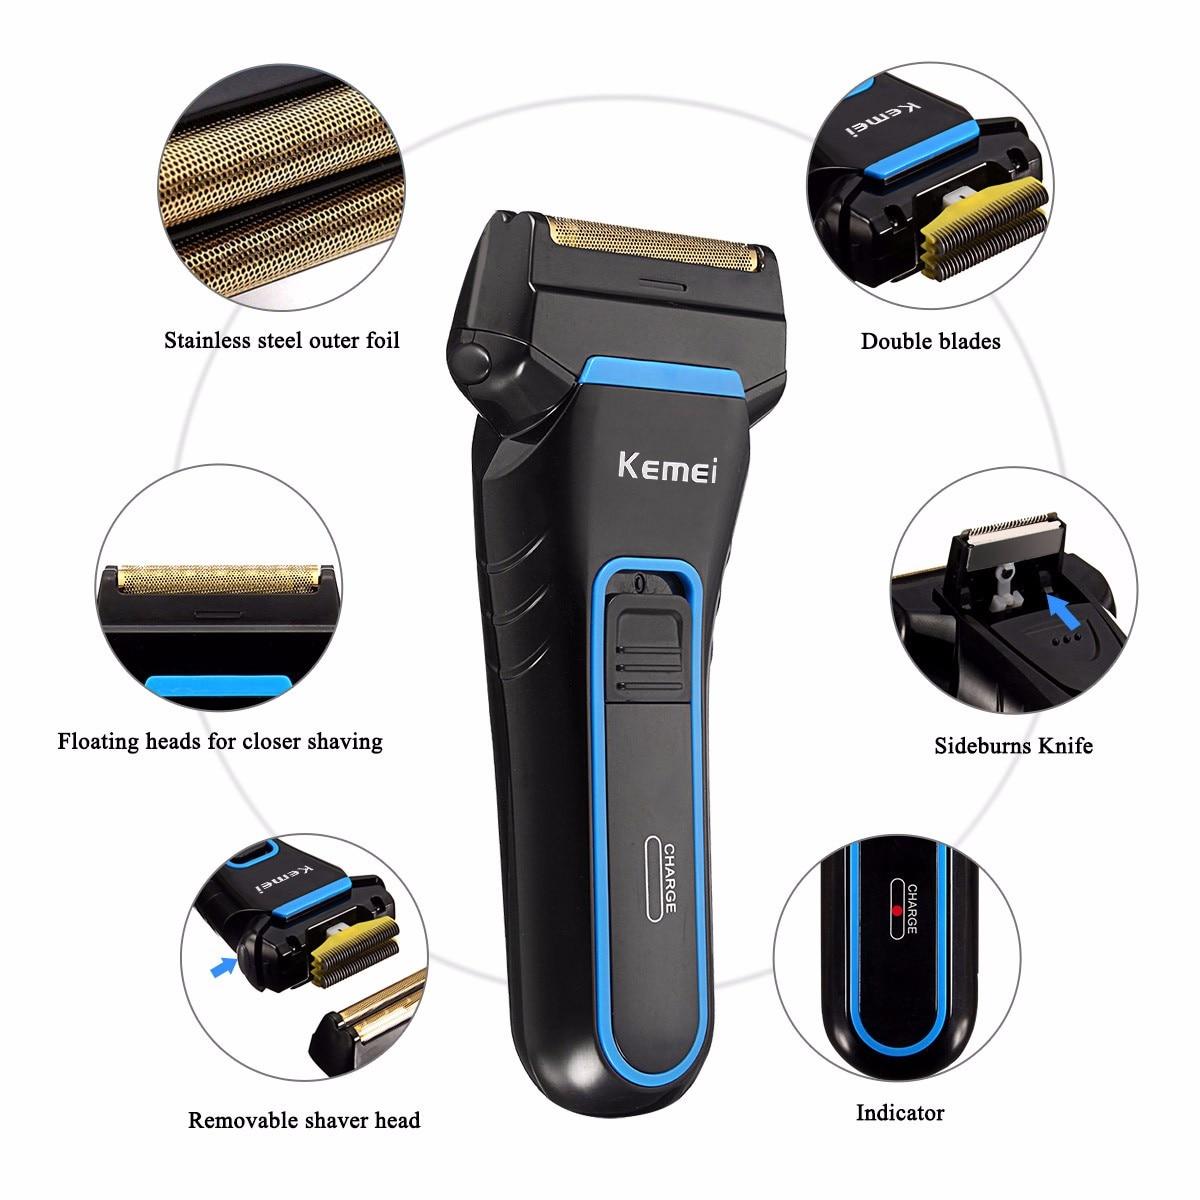 Kemei Men Electric Razor Shaver Portable Cordless Dual Foil Shaver Rechargeable Beard Razor Trimmer Razor Electric Shaver